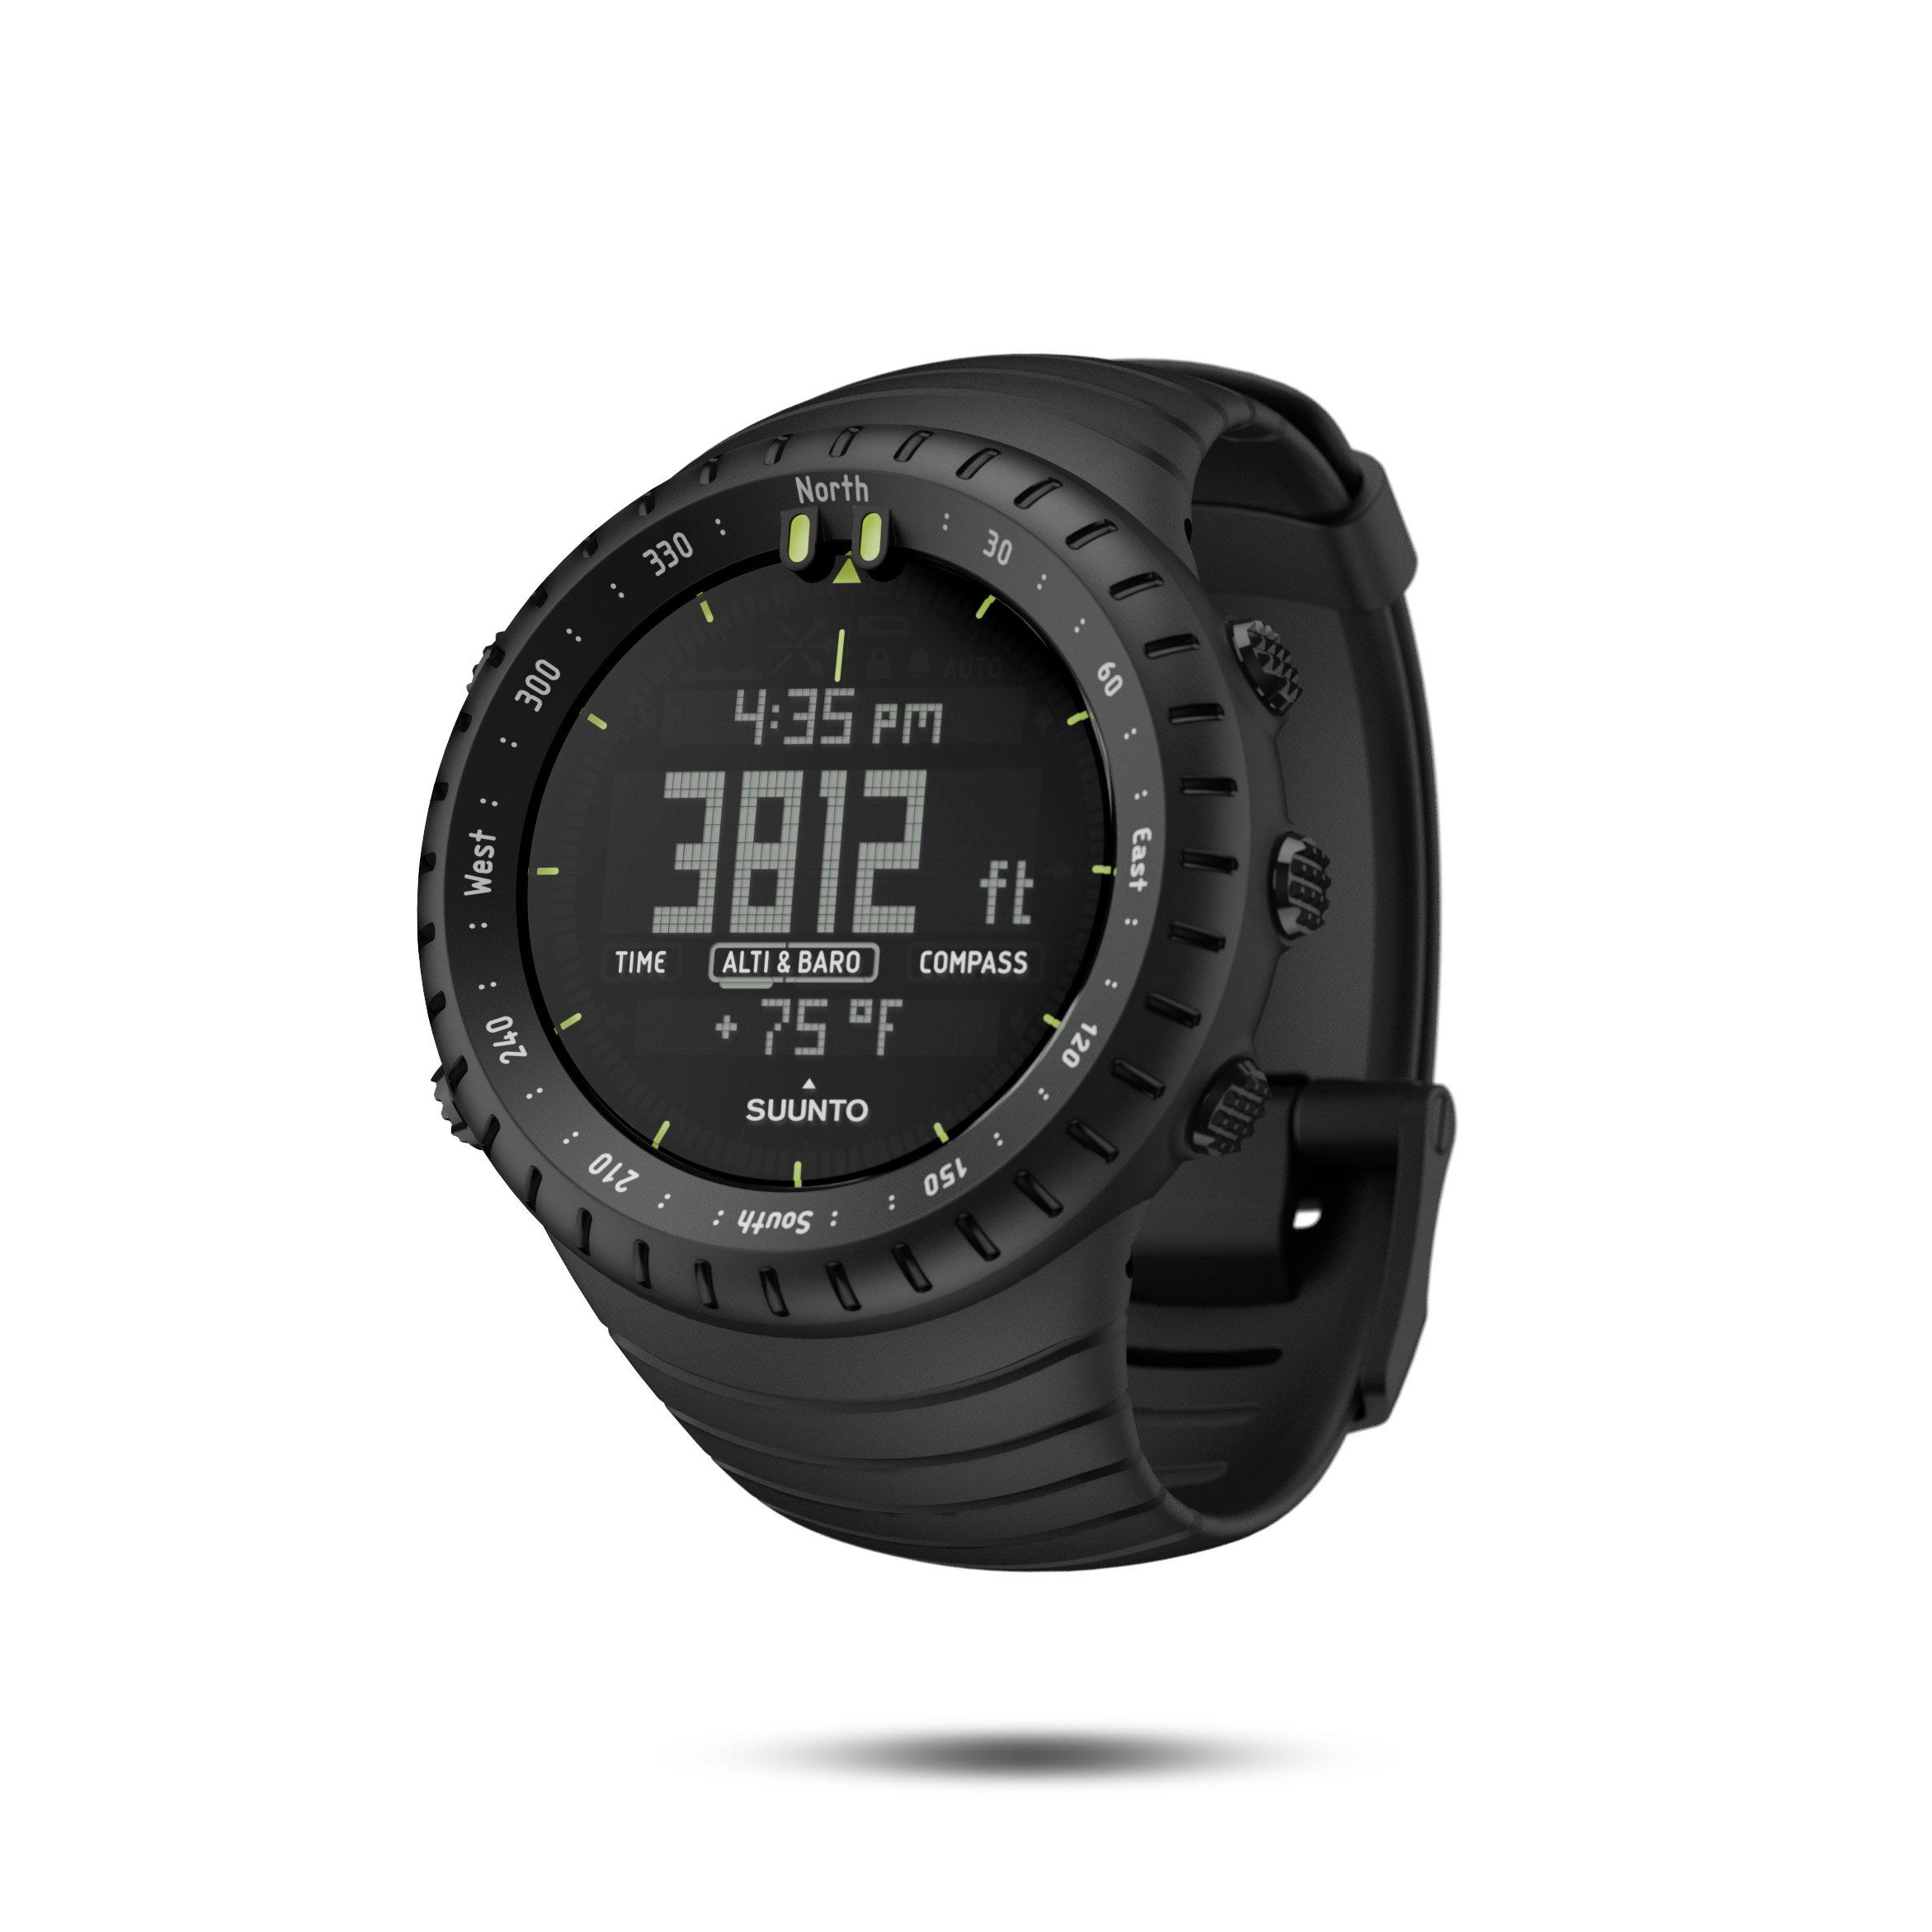 Suunto Core All Black Military Men's Outdoor Sports Watch - SS014279010 by Suunto (Image #2)